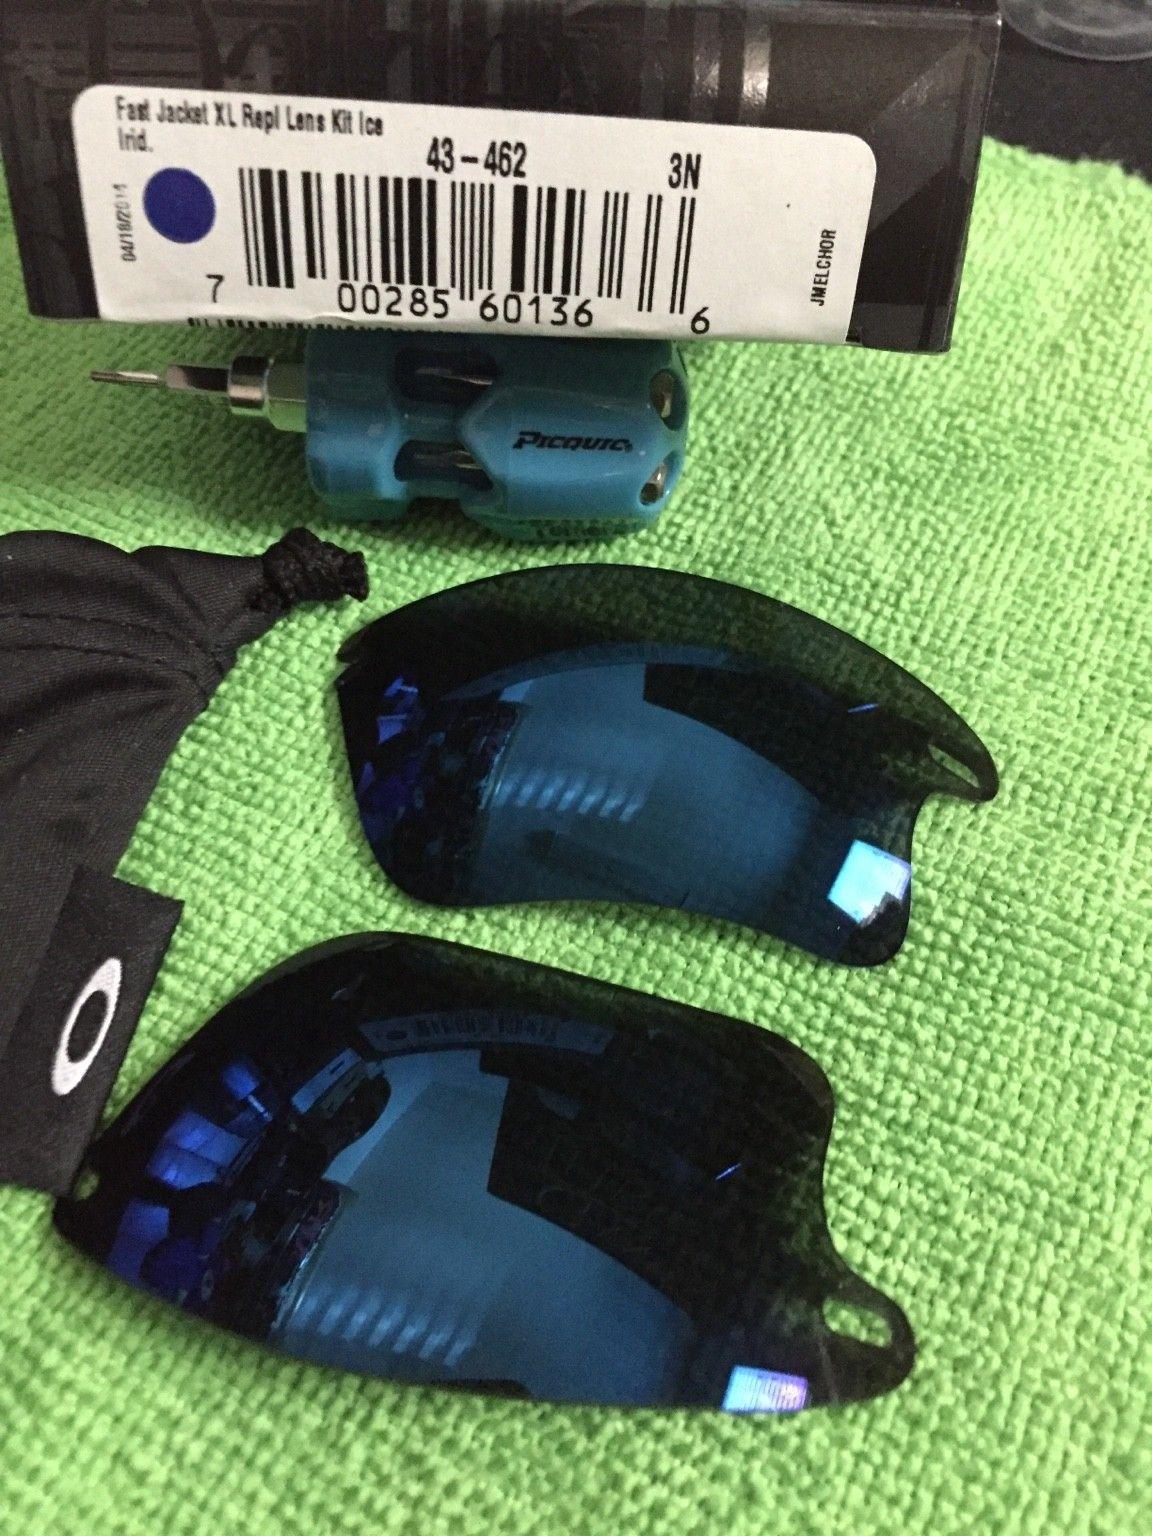 fast jacket XL for regular ice iridium replacement lens - ImageUploadedByTapatalk1445889392.086179.jpg